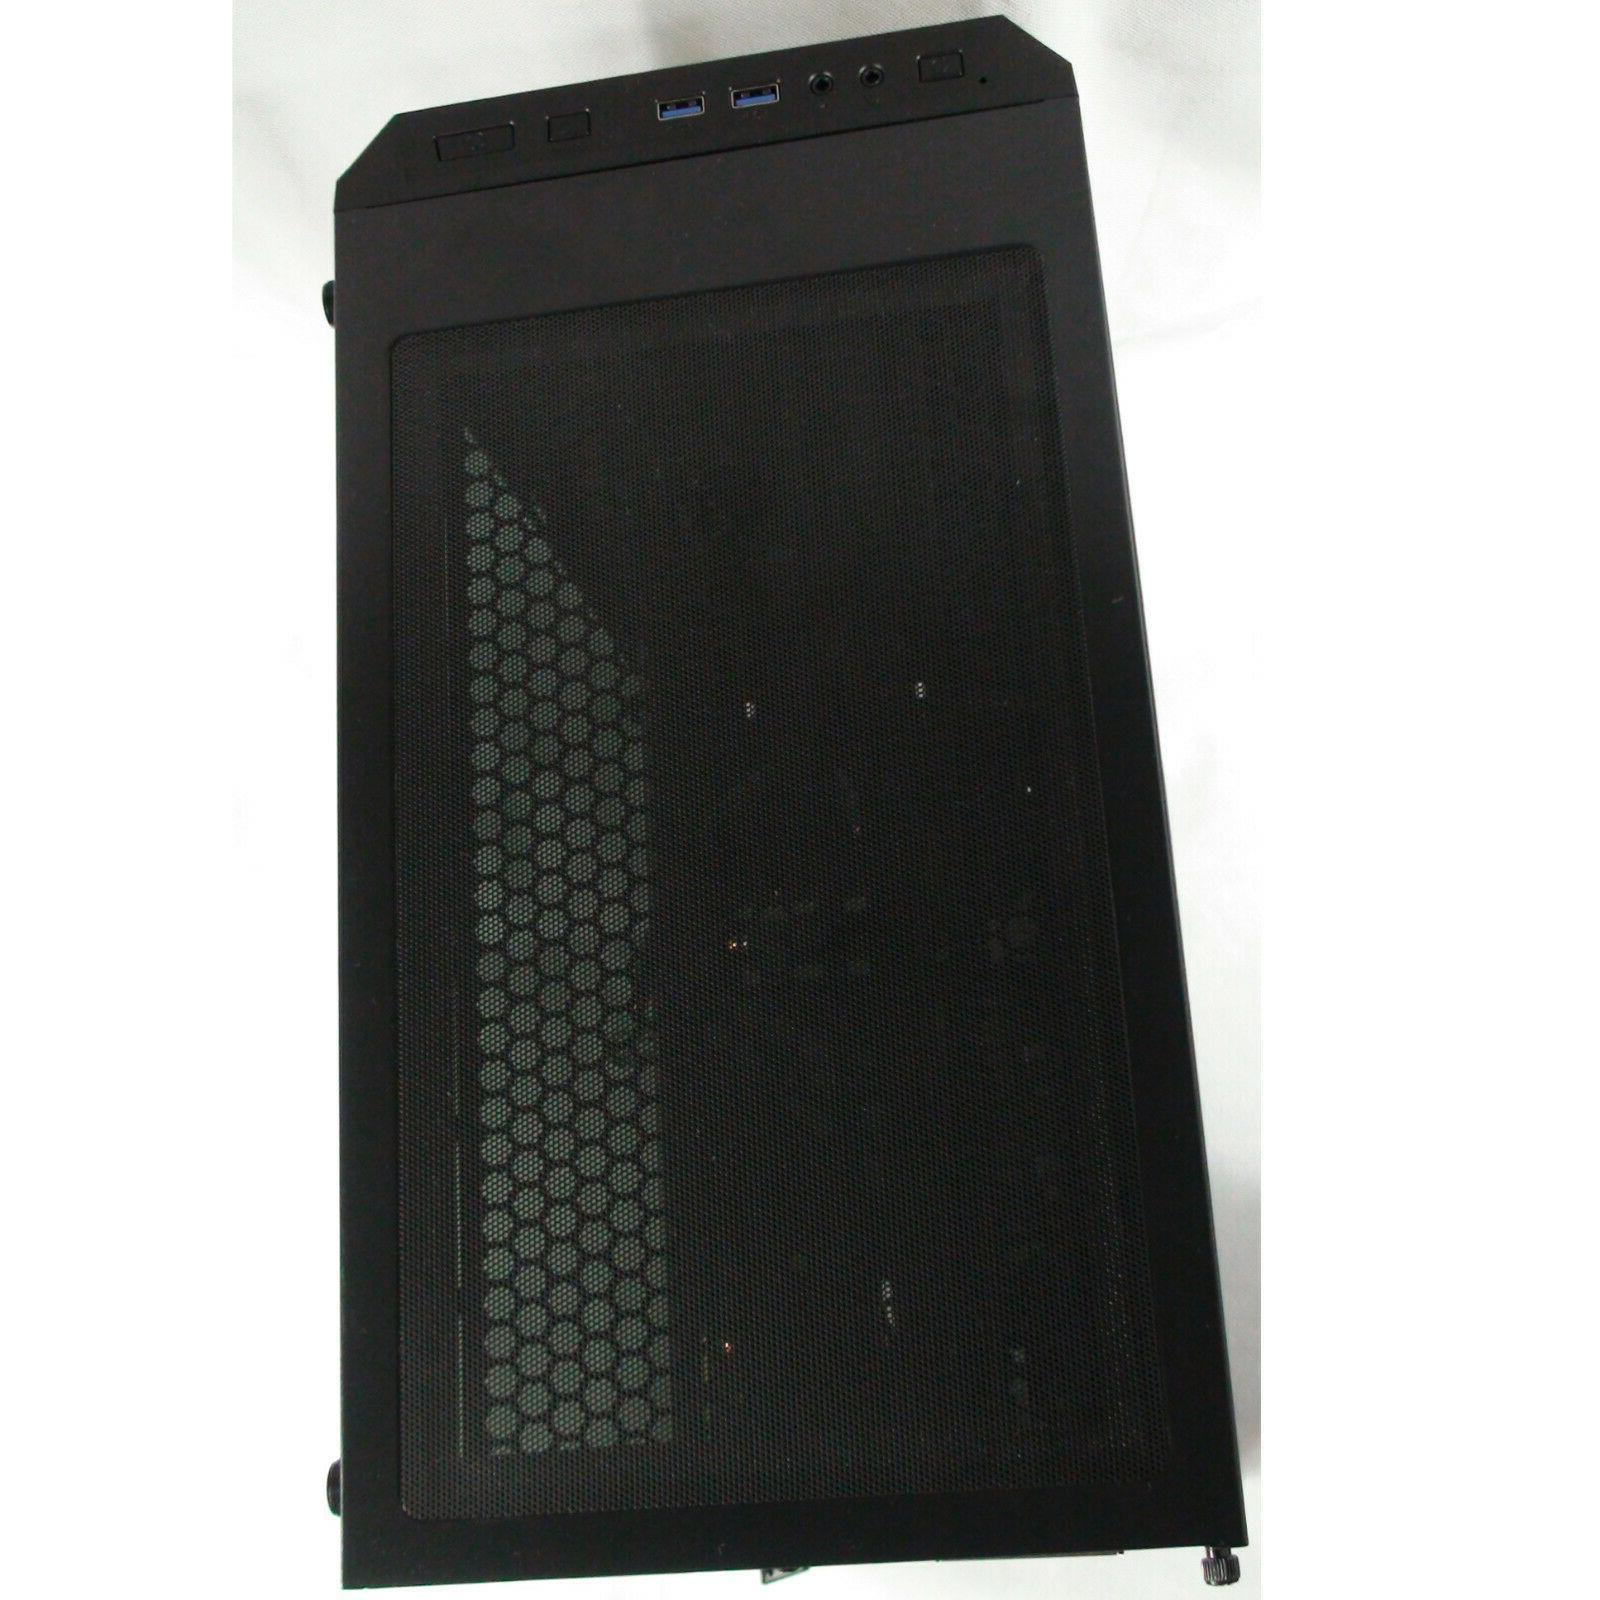 Intel 8-Core Gaming PC 2TB 1080